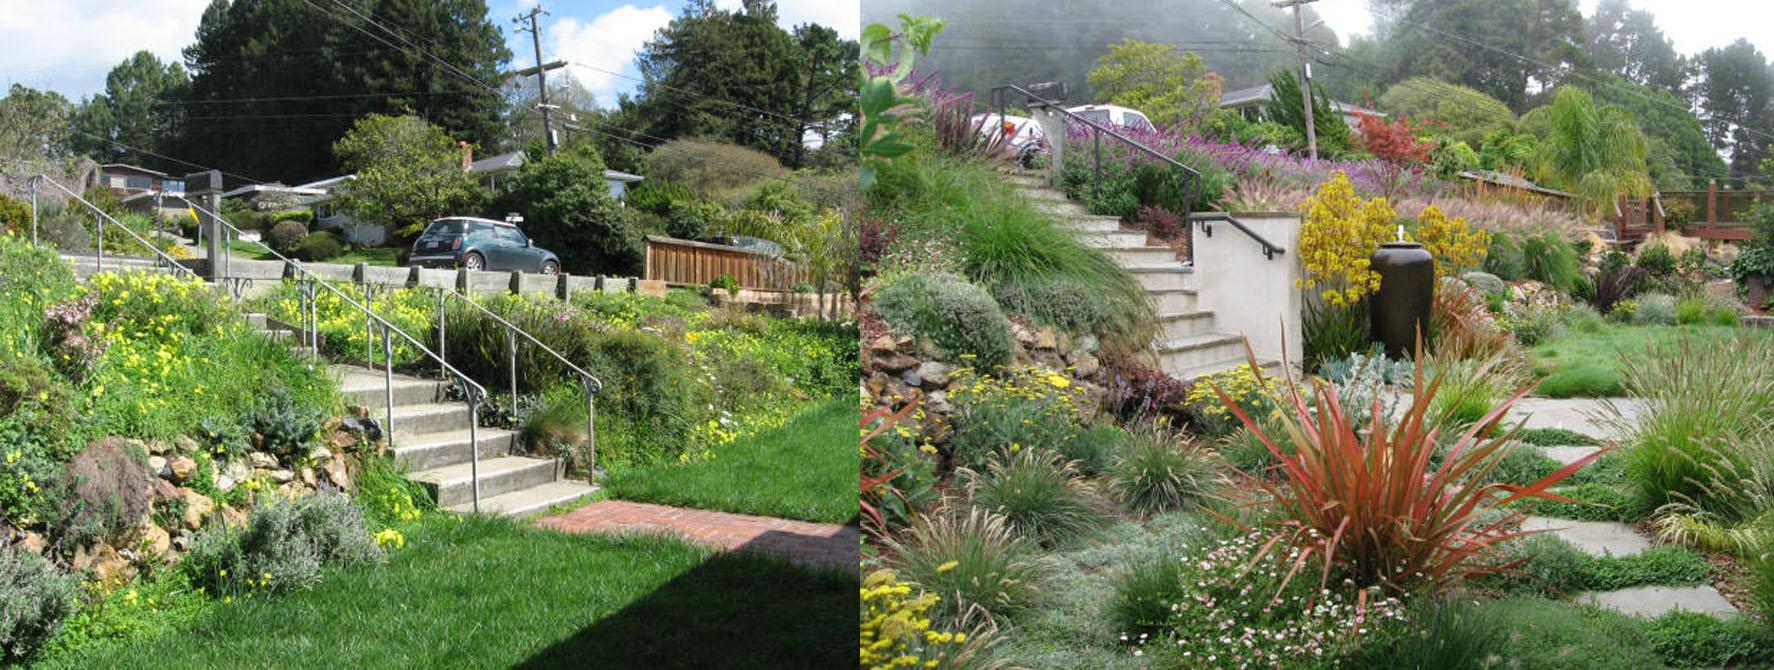 Landscaping Ideas for Hillside Backyard